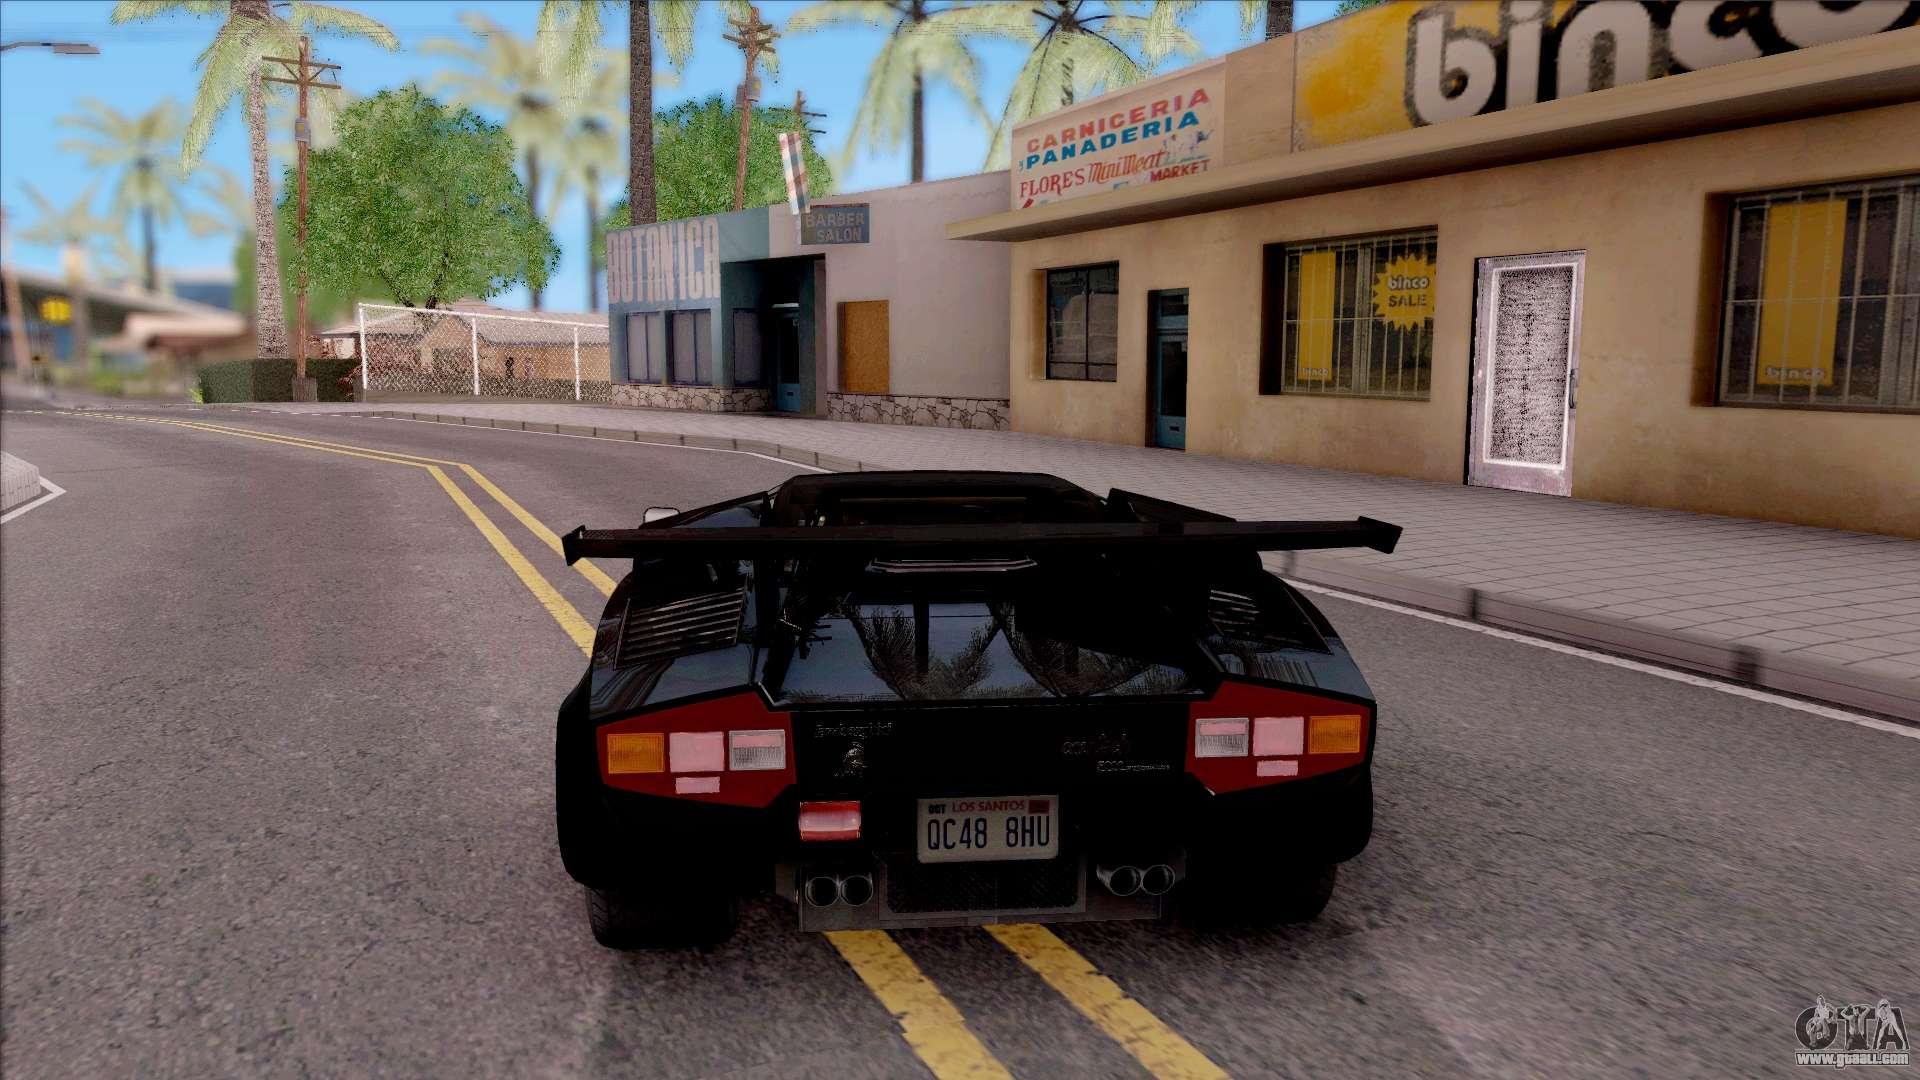 460967-enb2017-8-30-19-9-37 Surprising Lamborghini Countach 25th Anniversary asphalt 8 Cars Trend